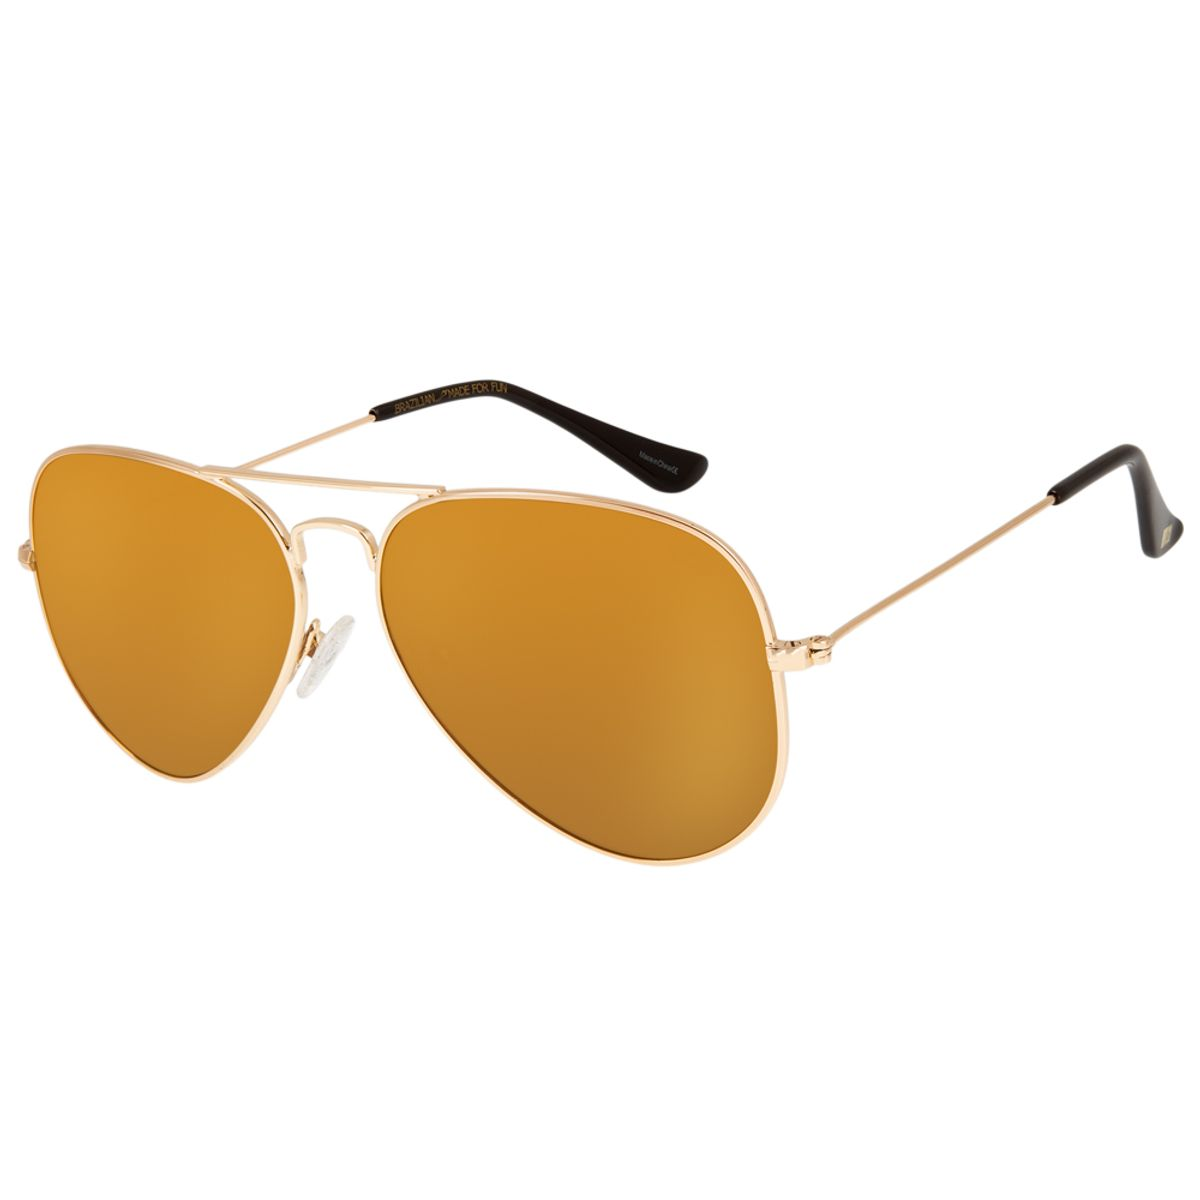 e3966f26d Óculos de Sol Aviador Unissex Chilli Beans Polarizado Dourado 2416 ...